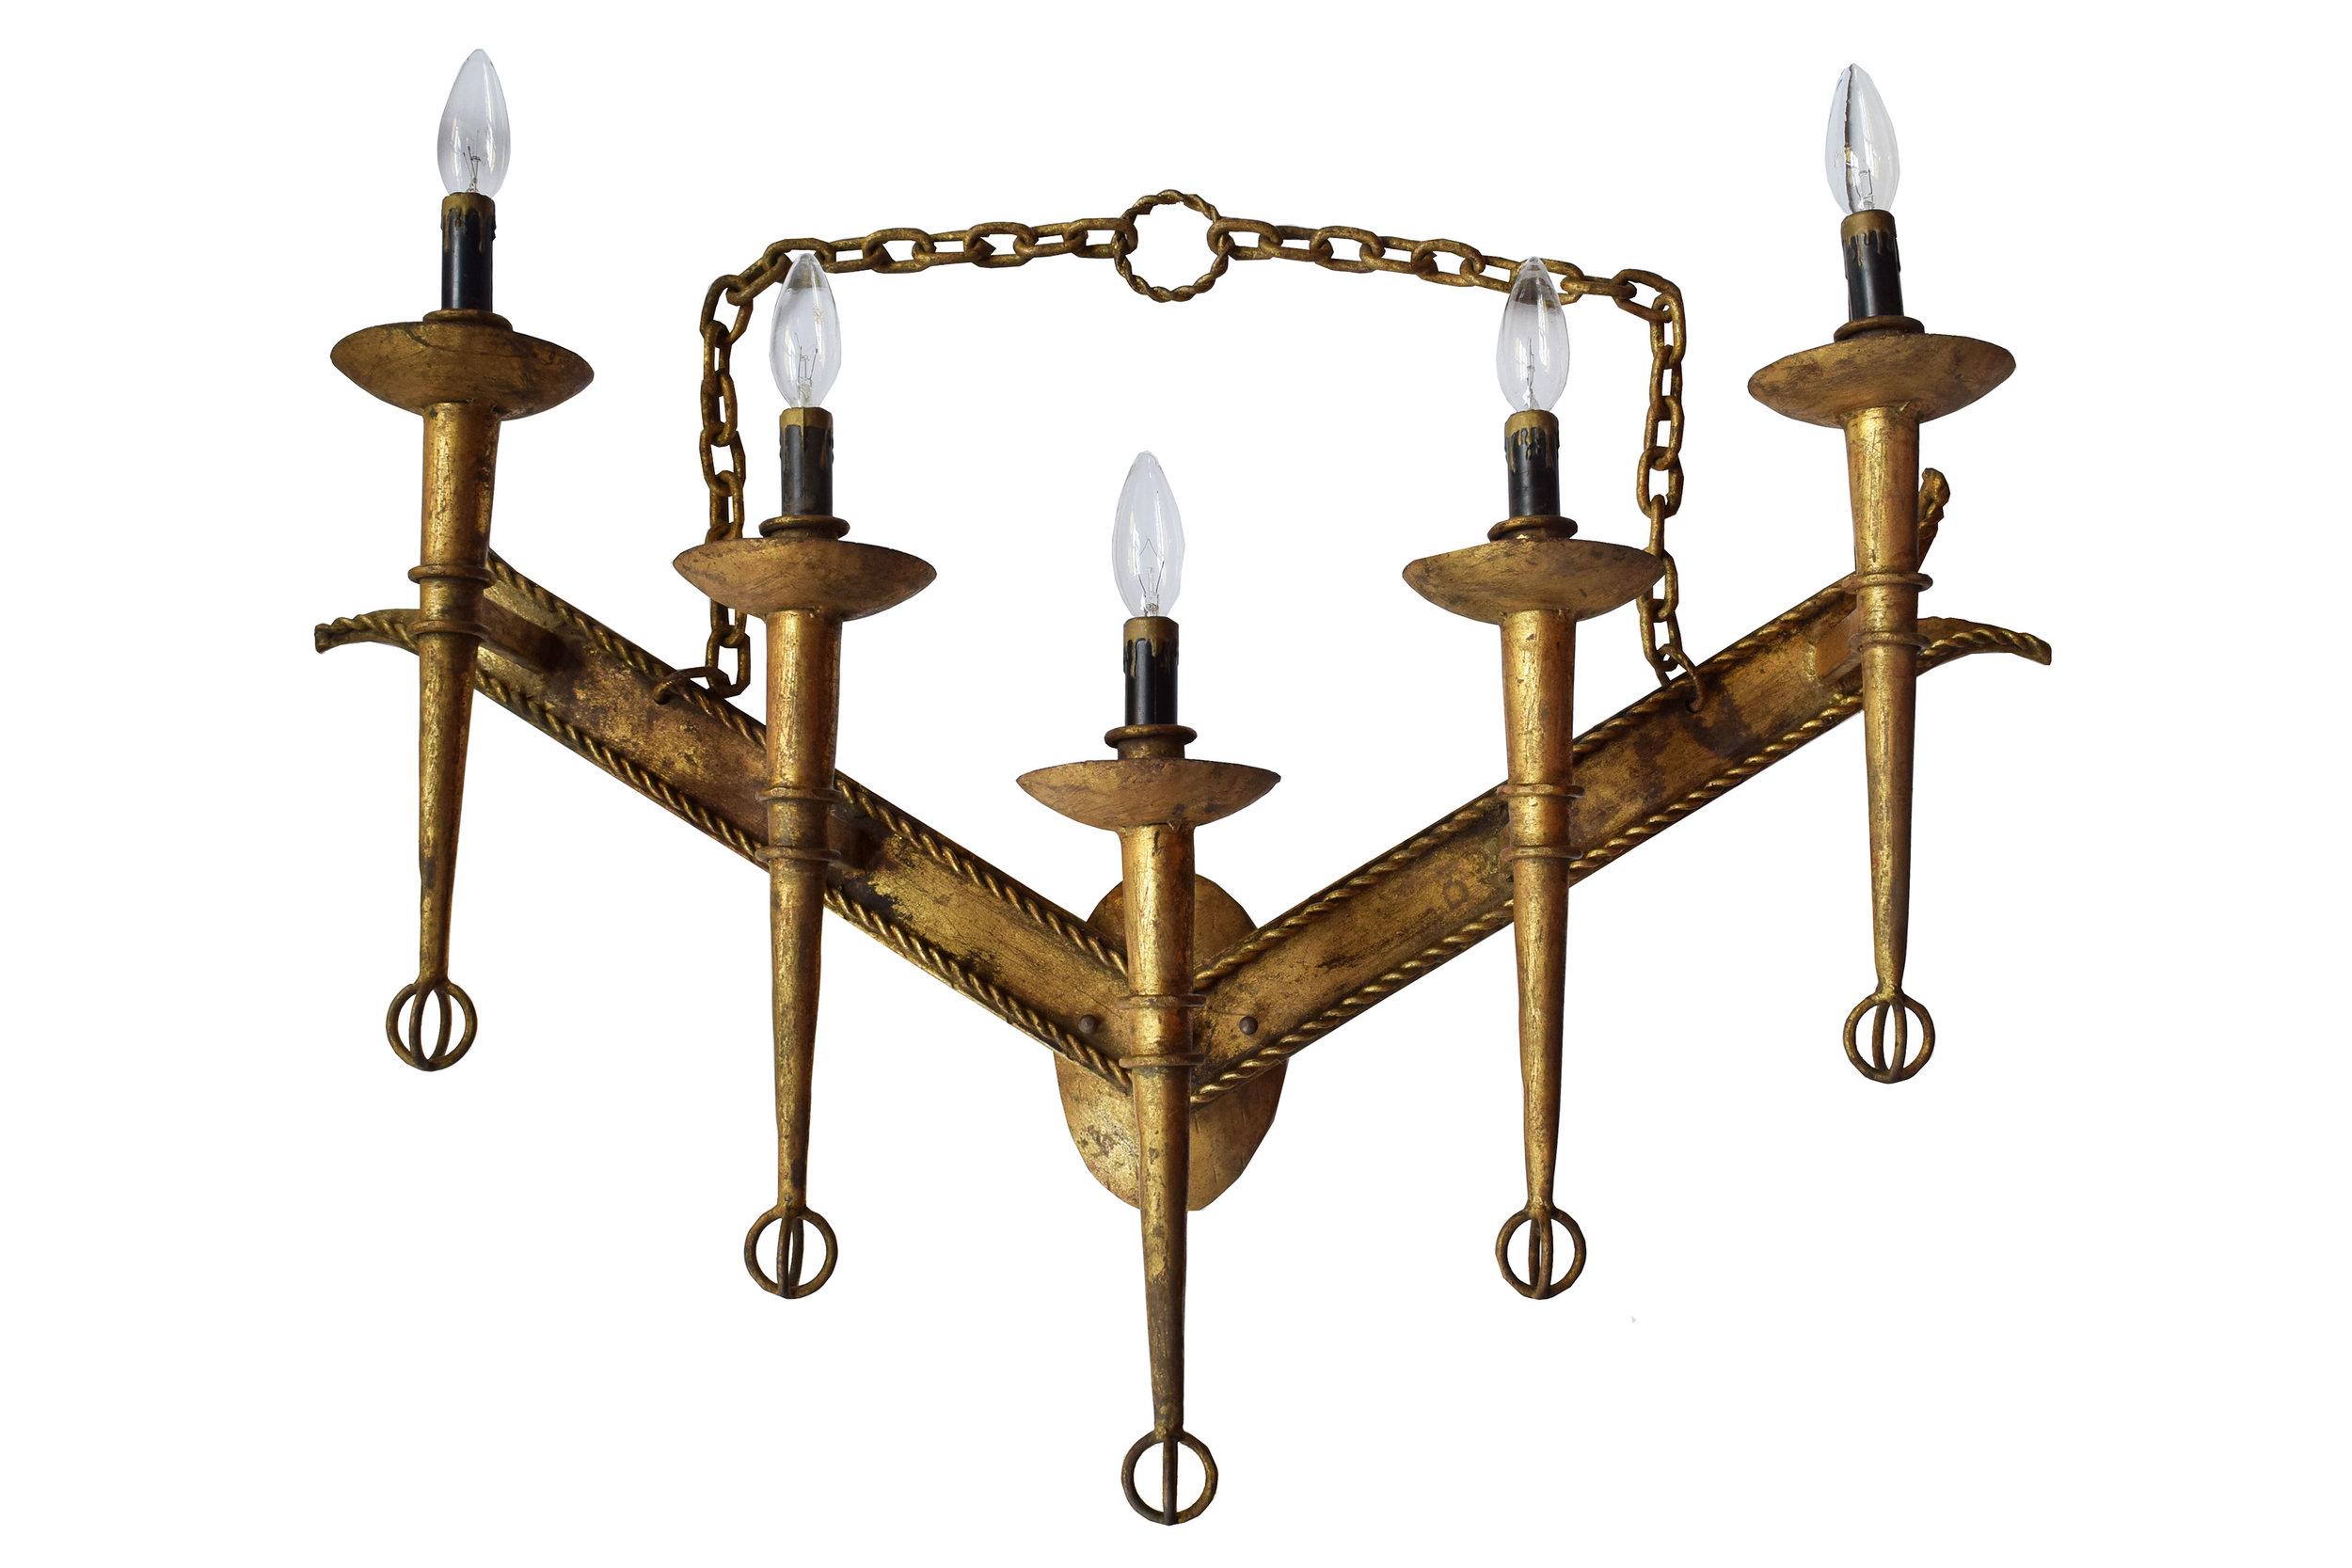 47035-5-candle-v-chand-main.jpg